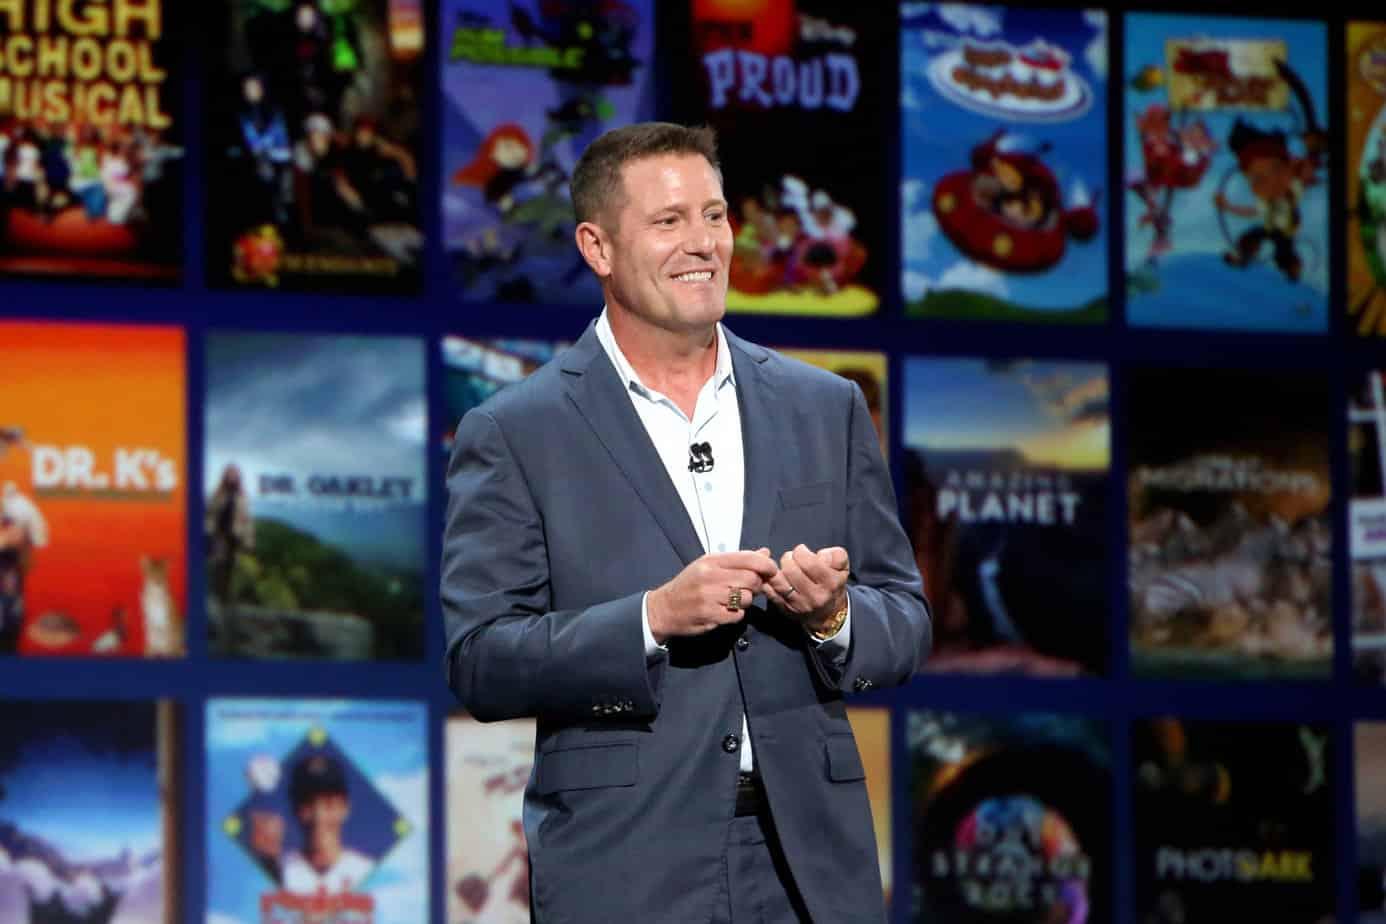 Disney streaming exec Kevin Mayer becomes TikTok's new CEO